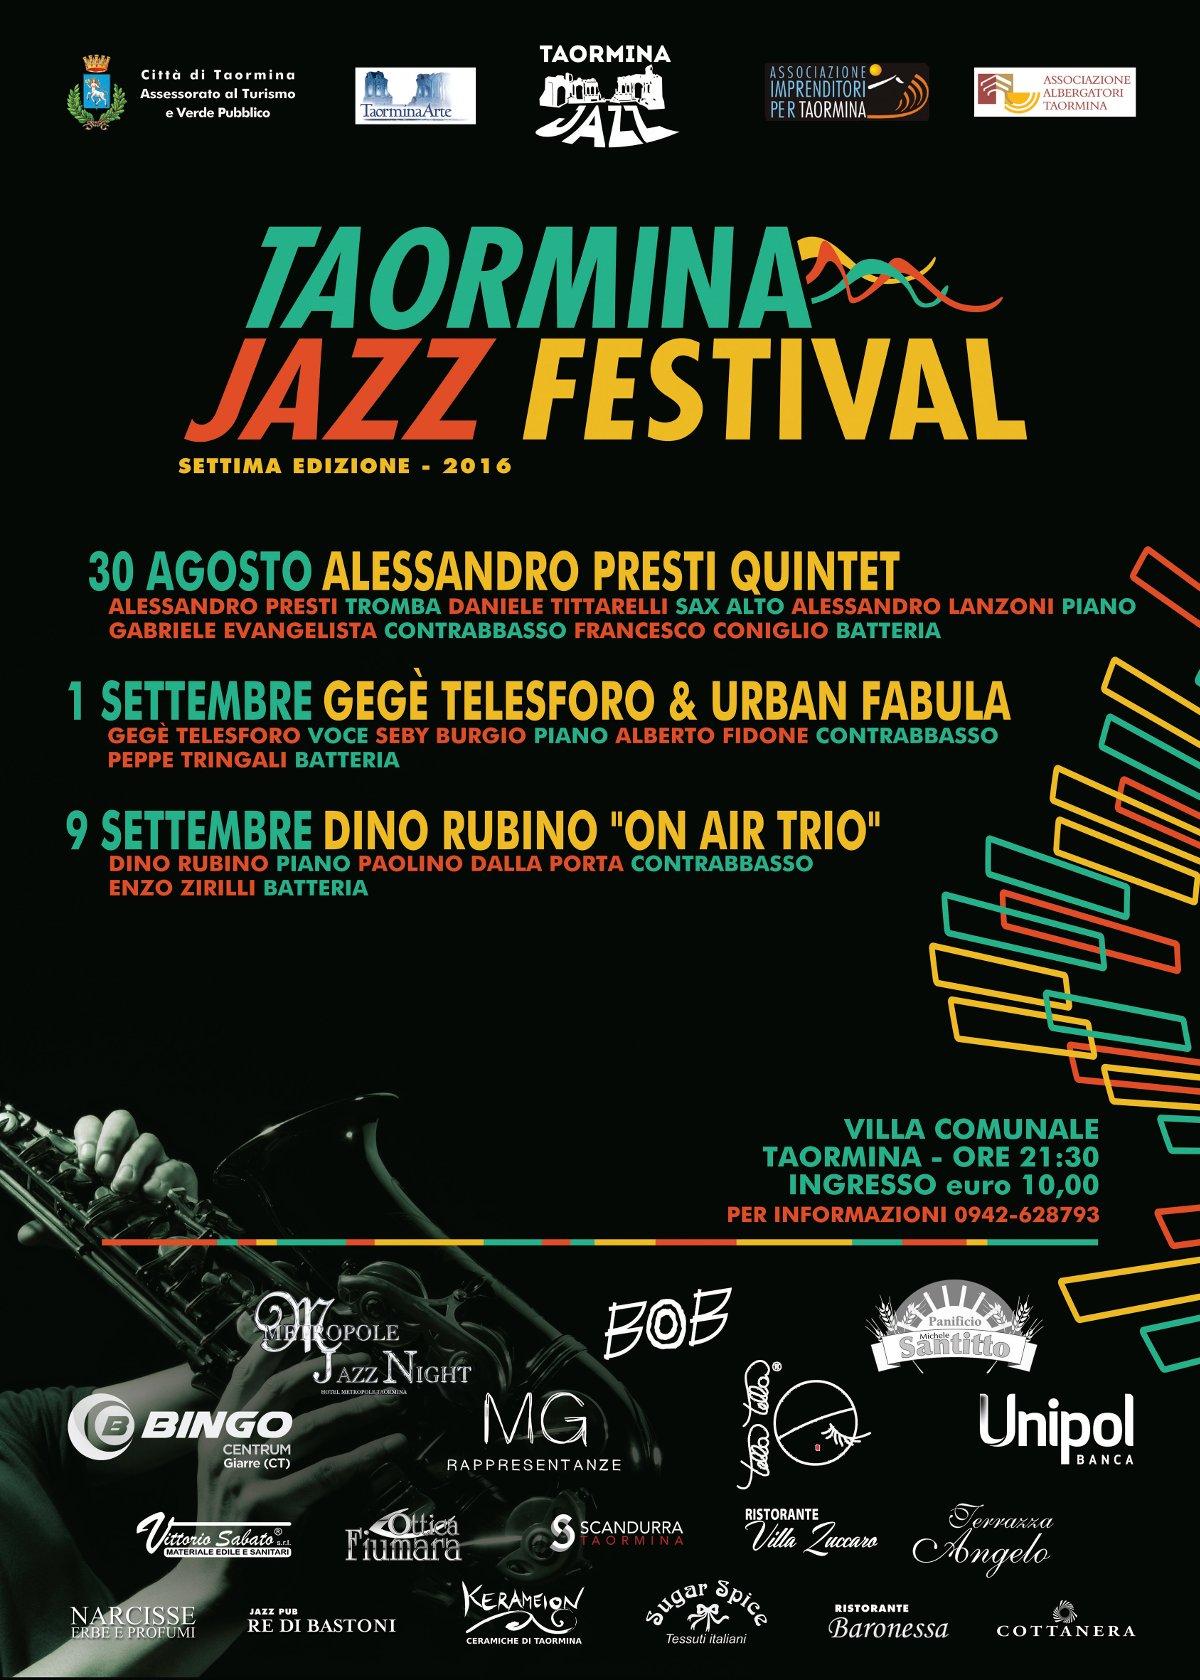 Taormina jazz taormina jazz festival 2016 for Roaming inghilterra